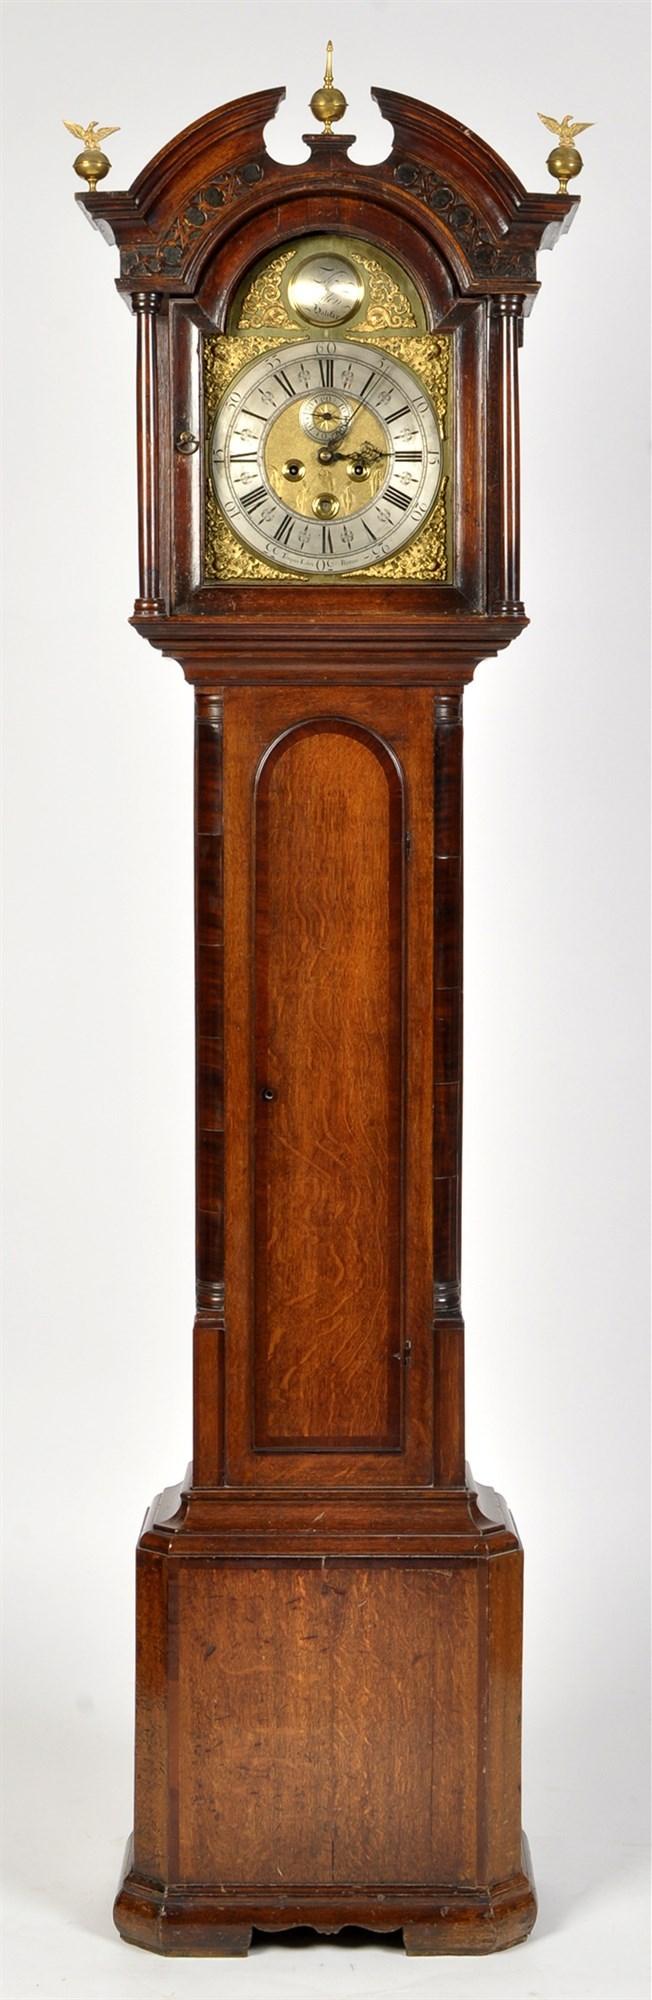 Thomas Ogden, Halifax: a George III oak and mahogany banded longcase clock,